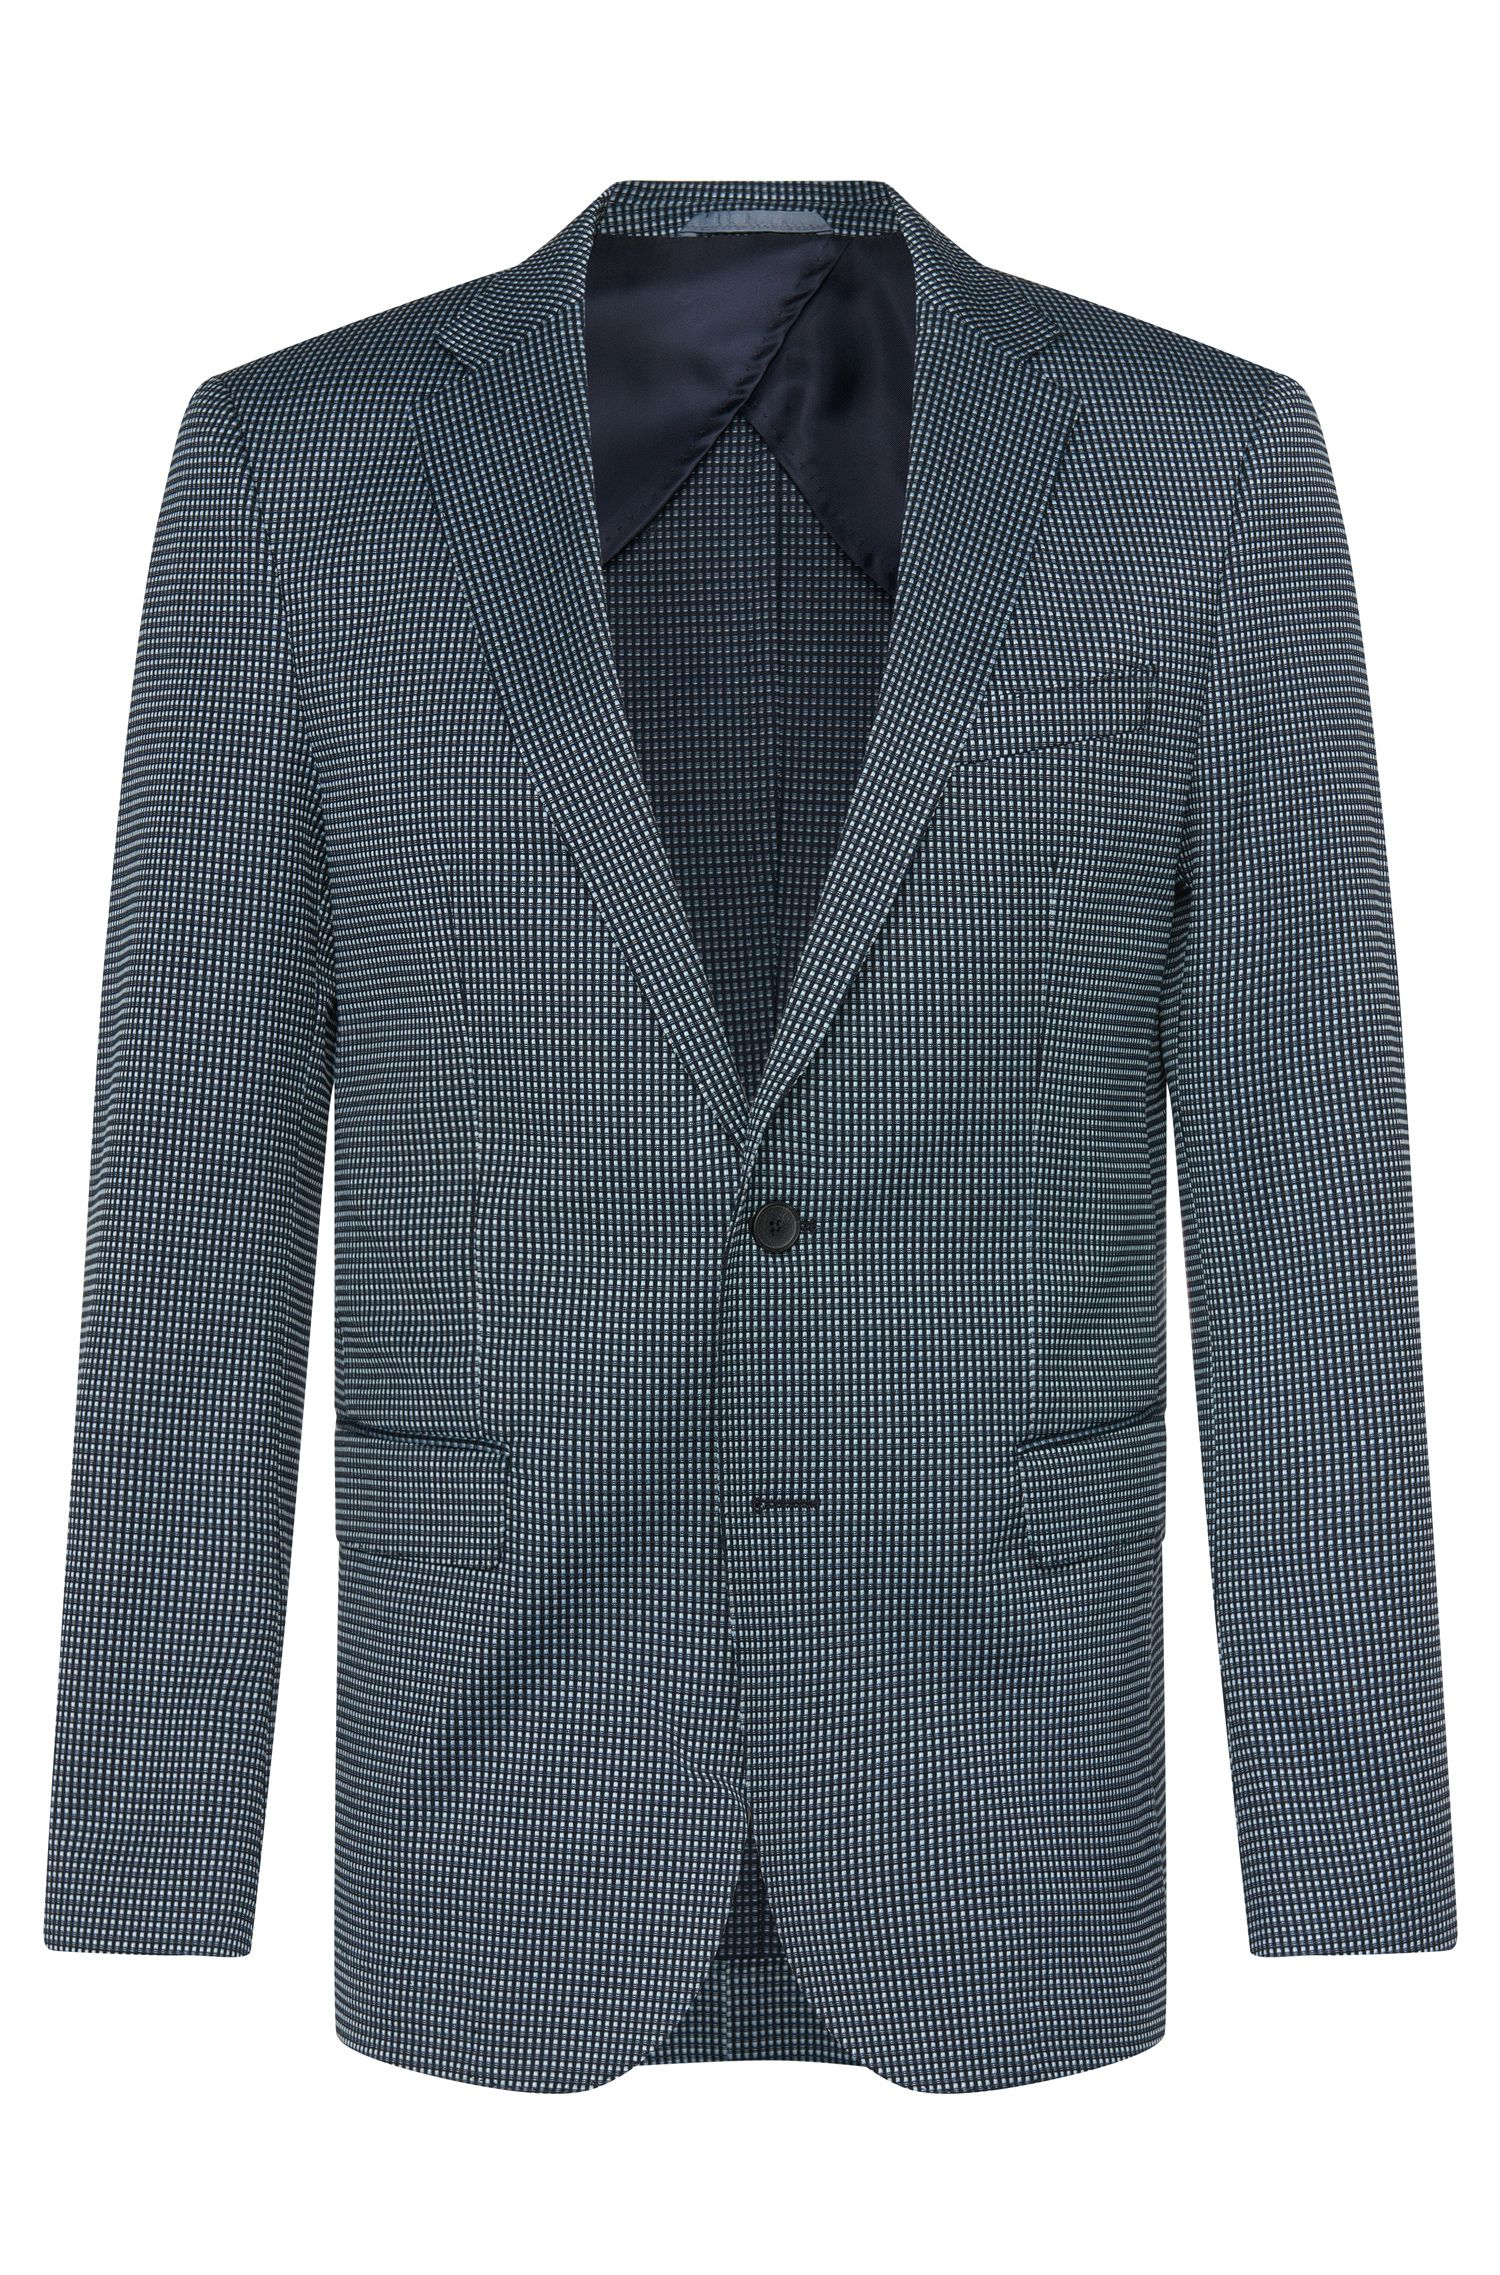 'Nobis' | Slim Fit, Stretch Cotton Blend Patterned Sport Coat